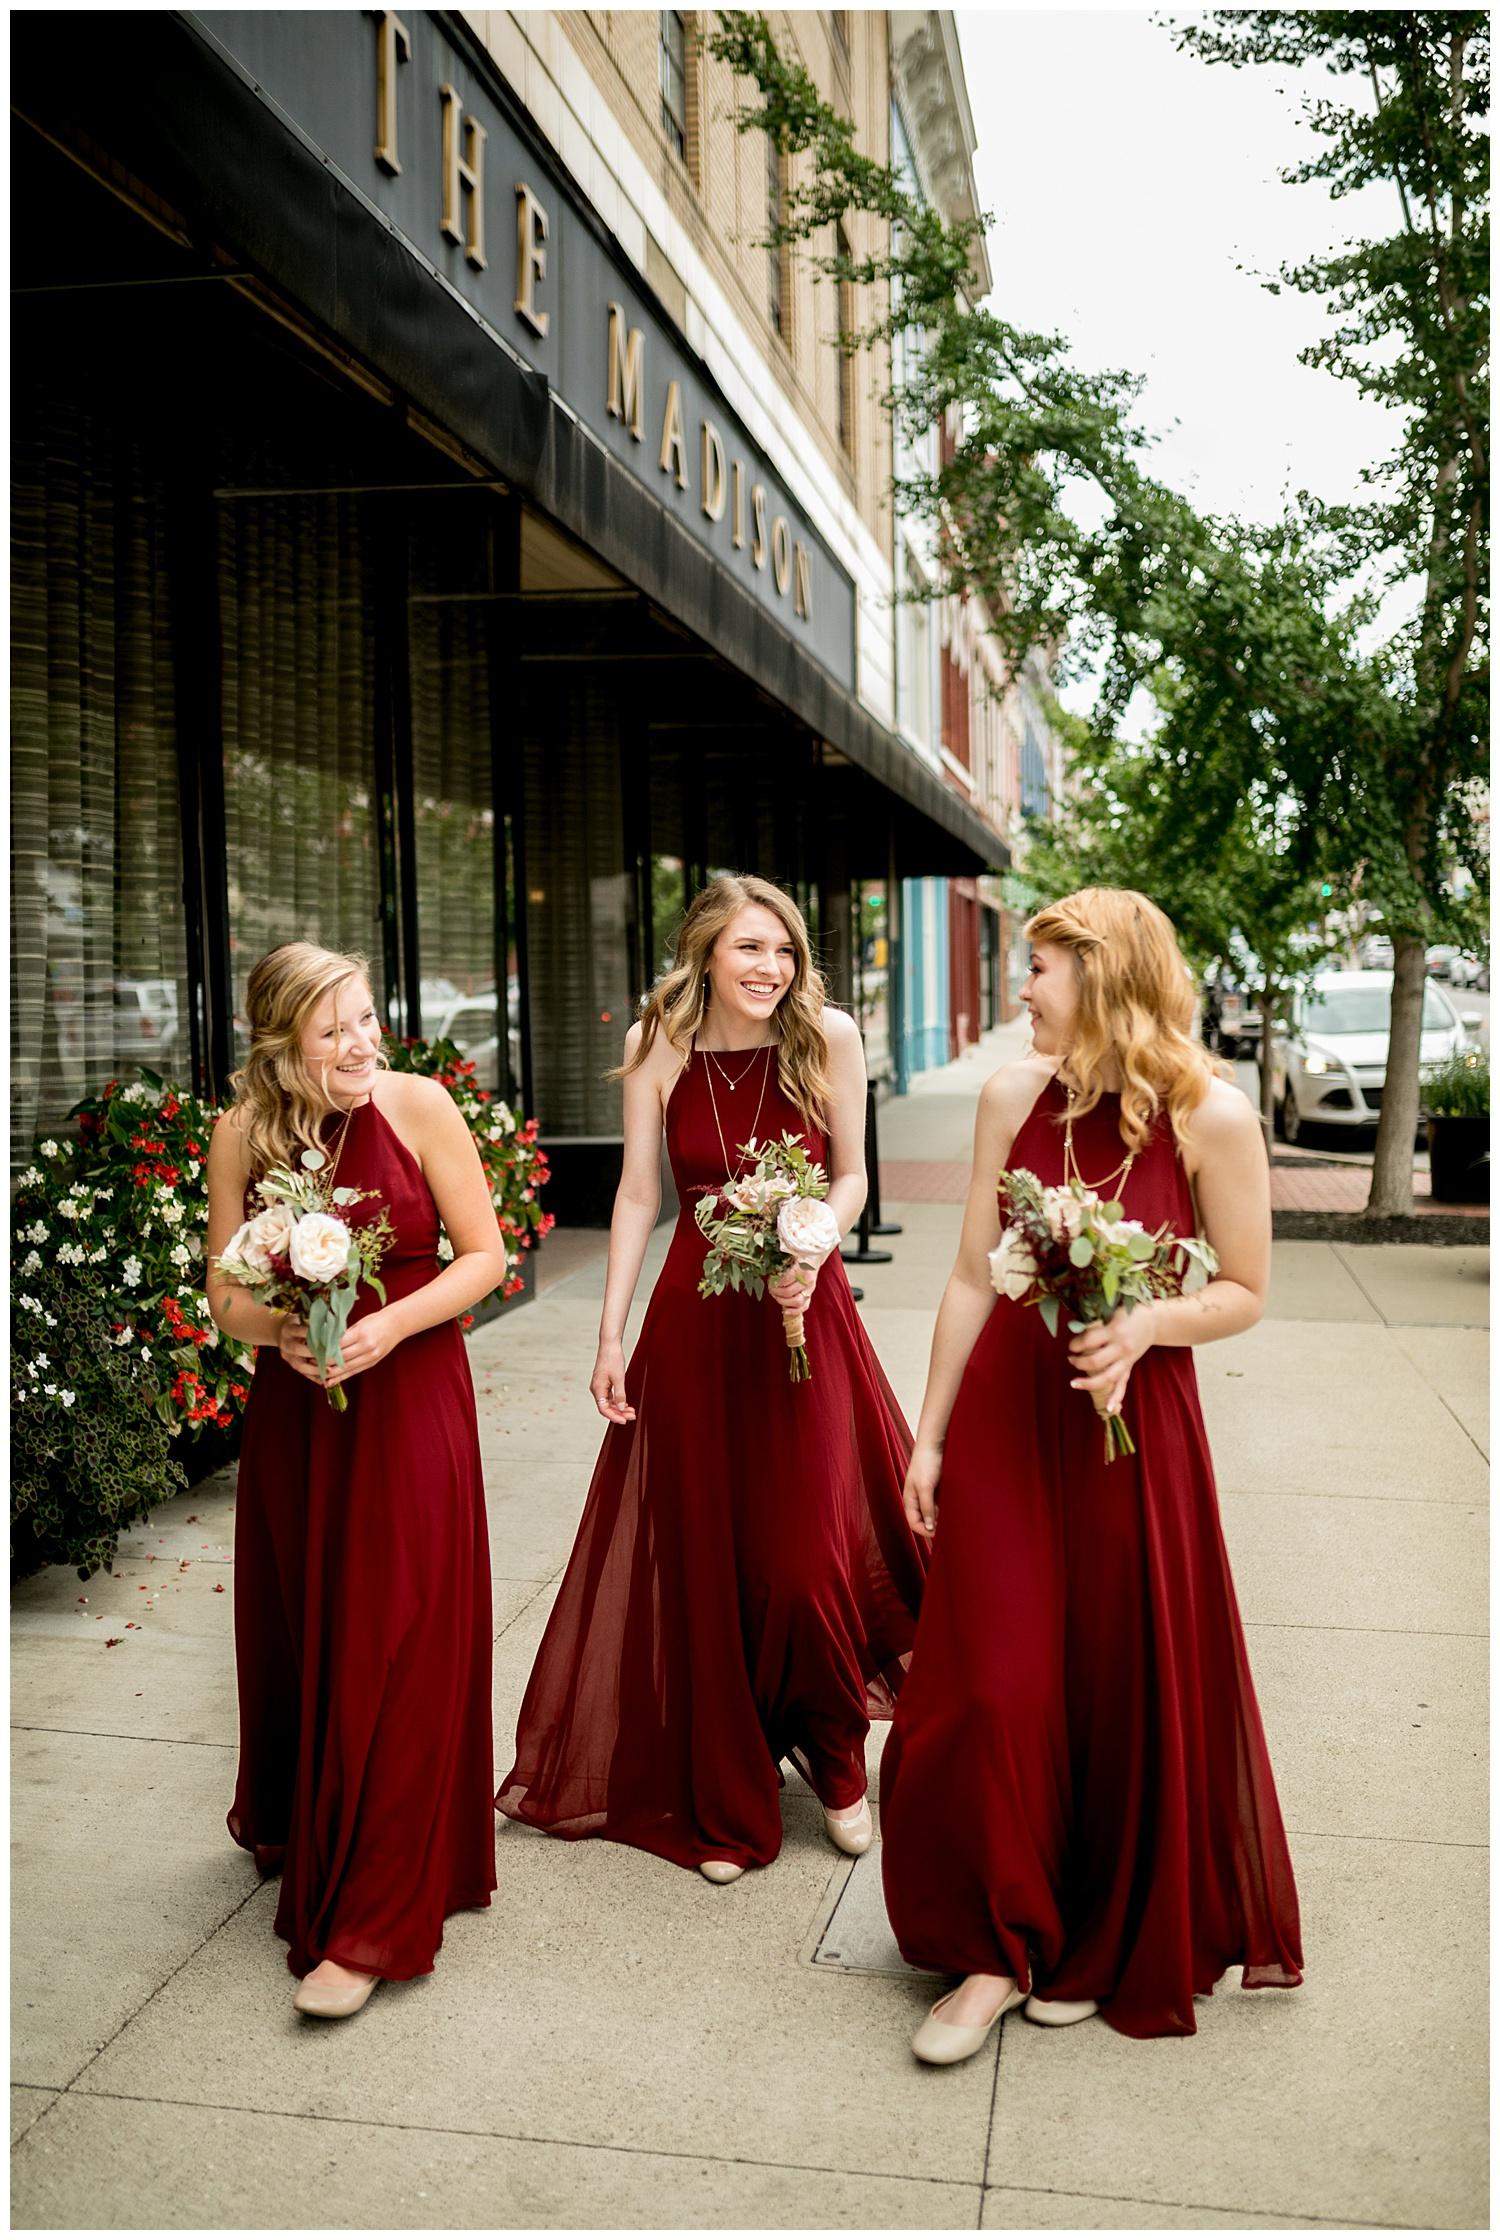 TheSmythCollective-Best-Cincinnati-Wedding-Photographer-Urban-Downtown-Covington-Wedding-12.jpg